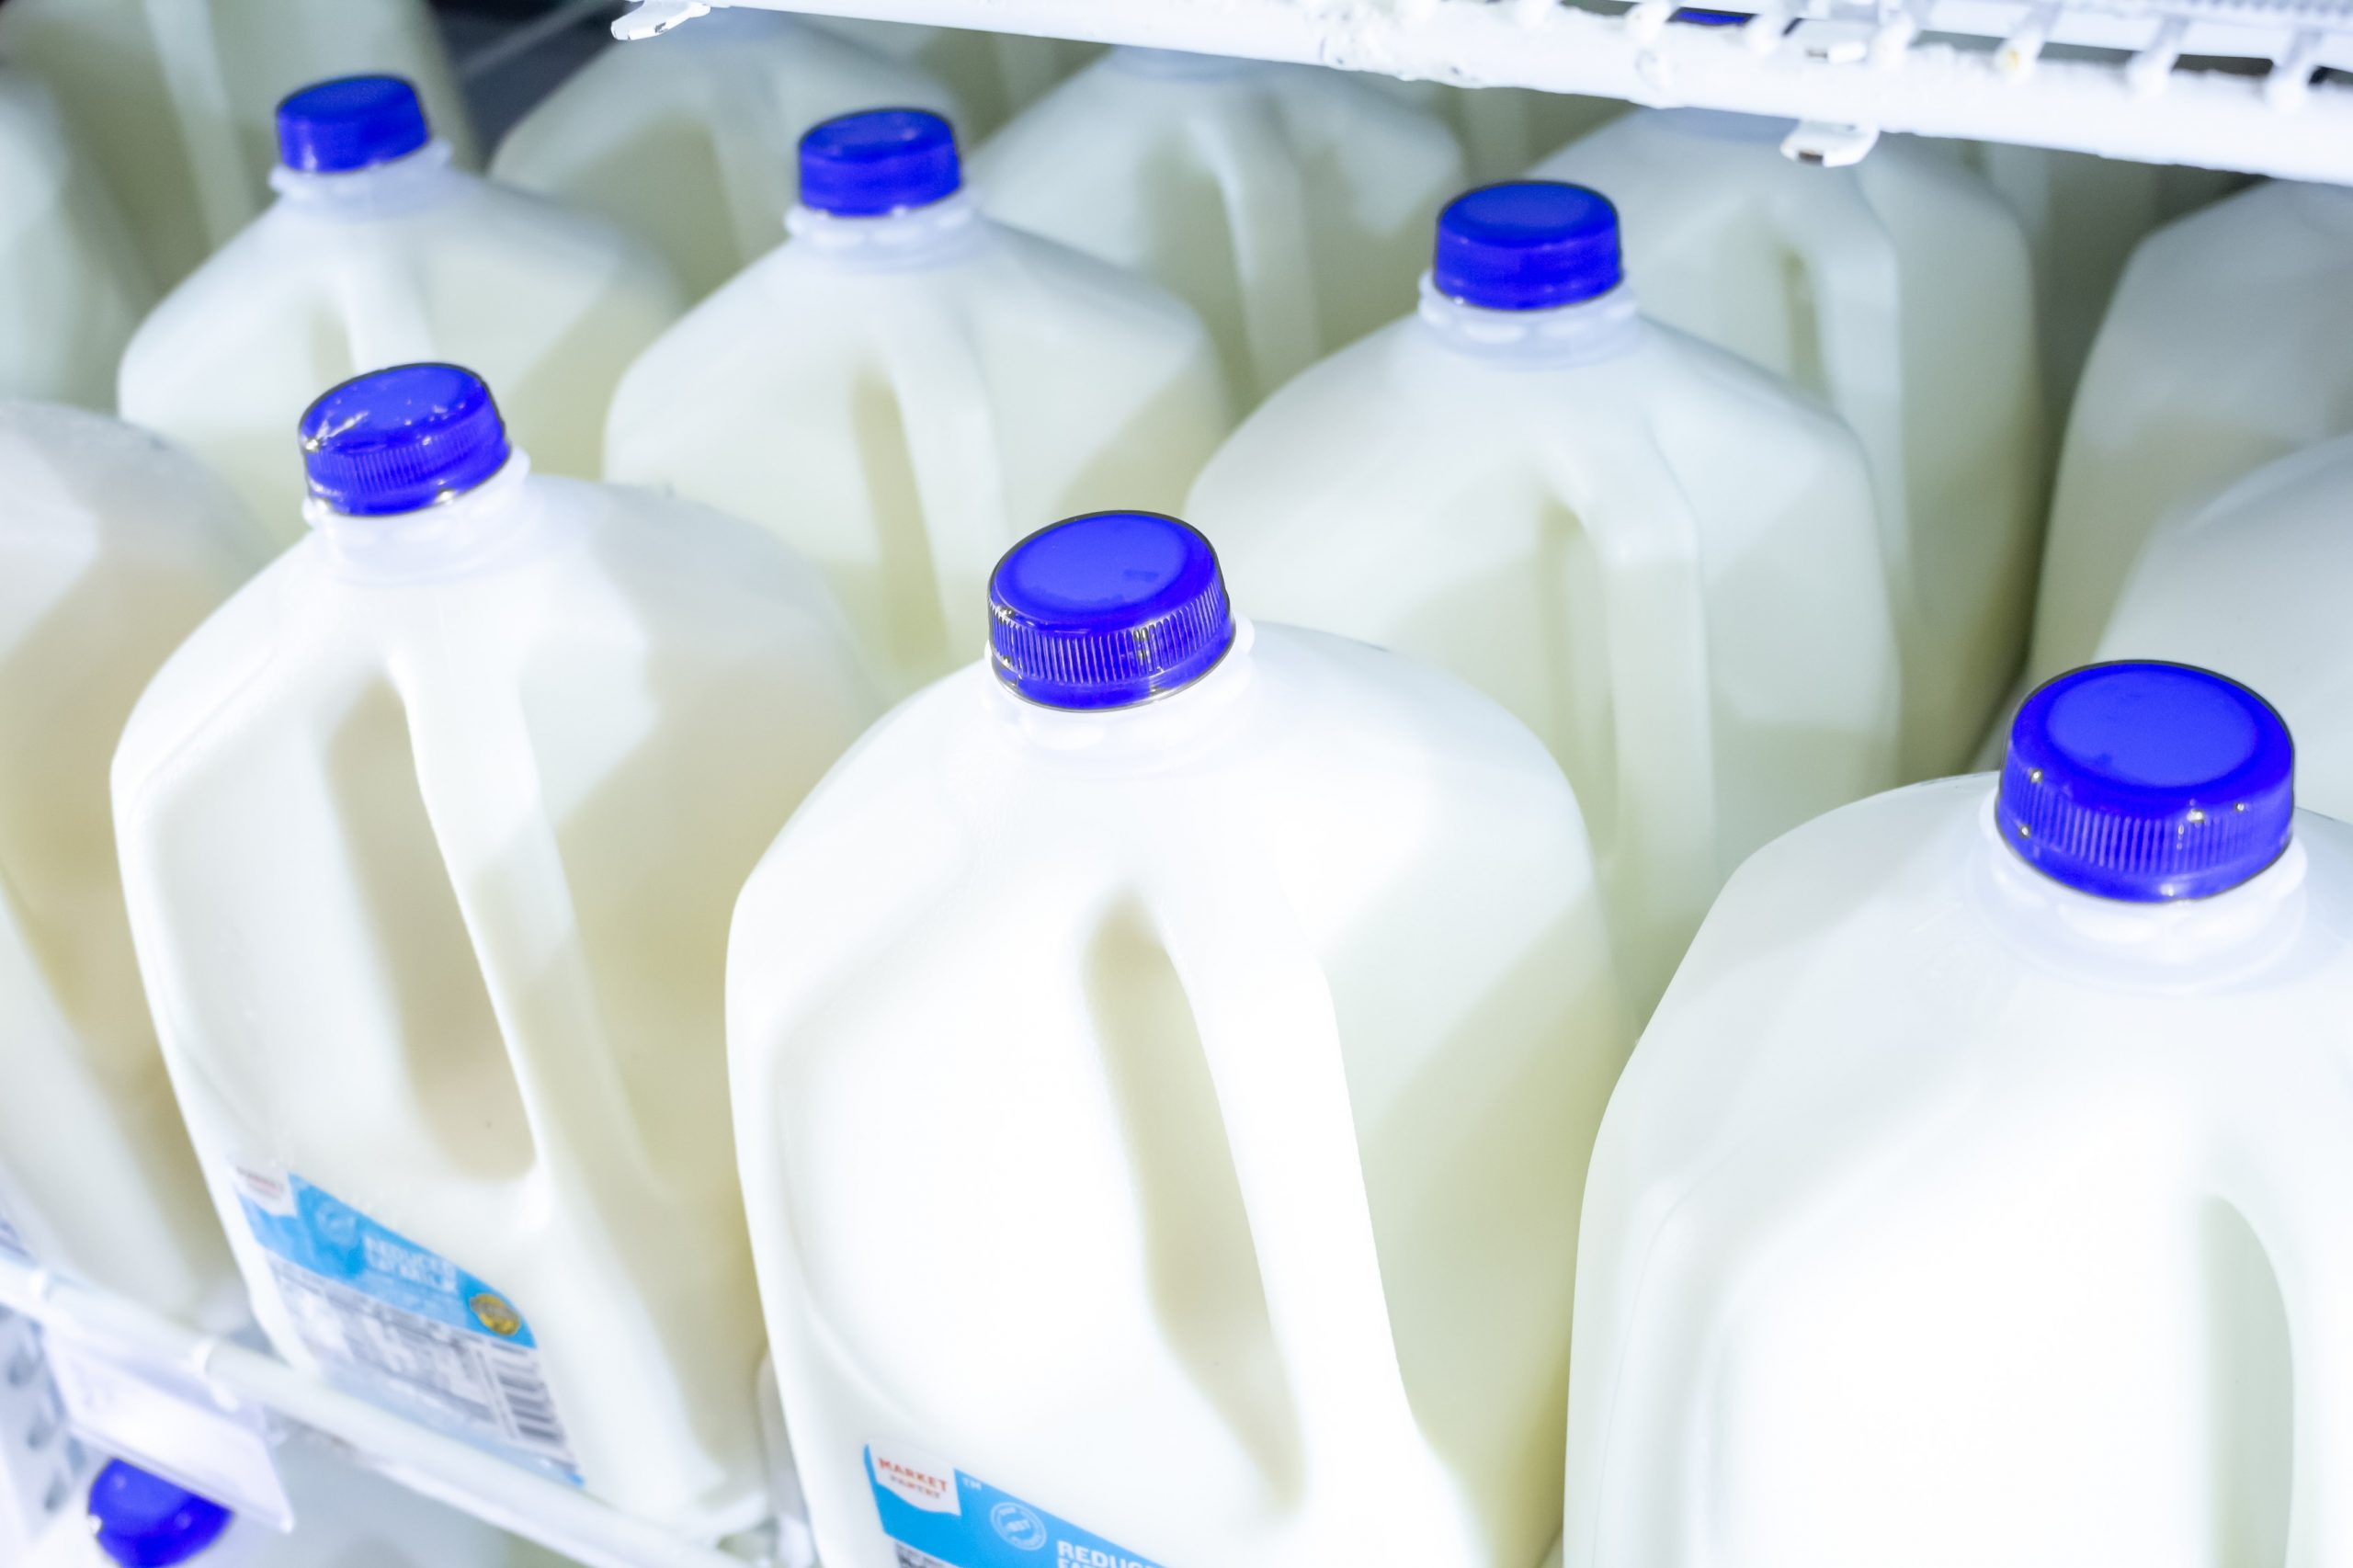 Gallons milk scaled jpg?fit=2560,1706&ssl=1.'